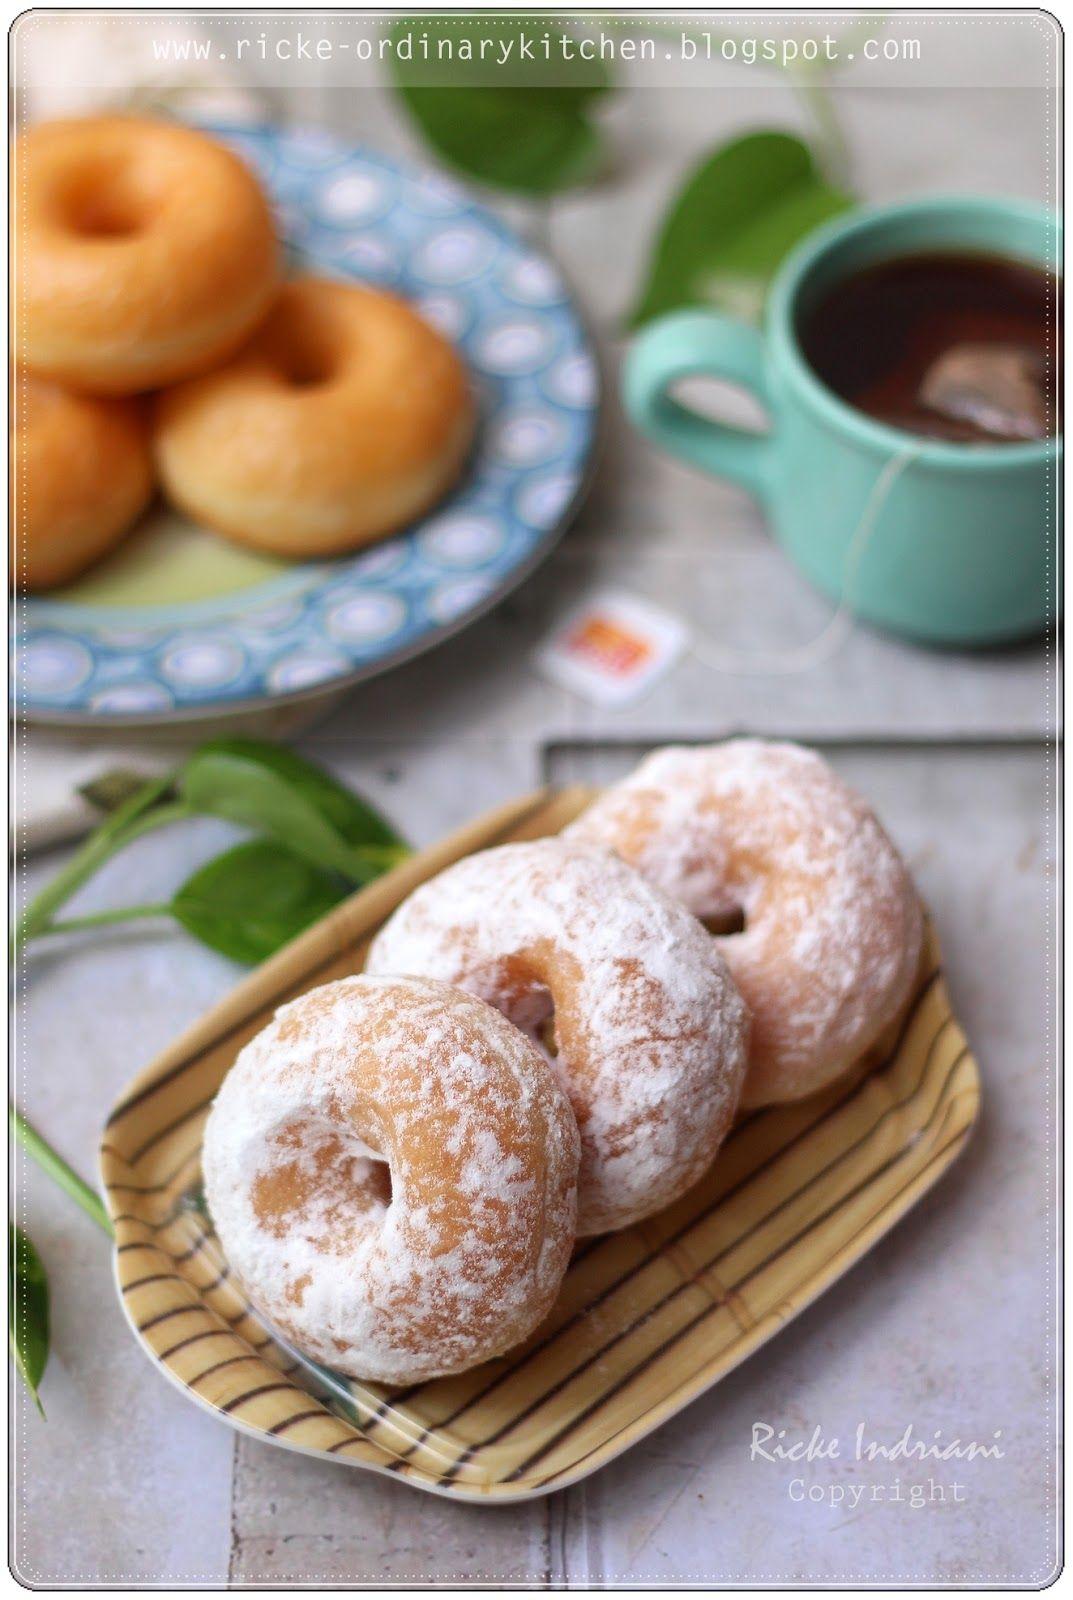 Just My Ordinary Kitchen Donat Jadul Balut Gula Sugar Moring Cimol Kering Original Ampamp Pedas Coated Donuts